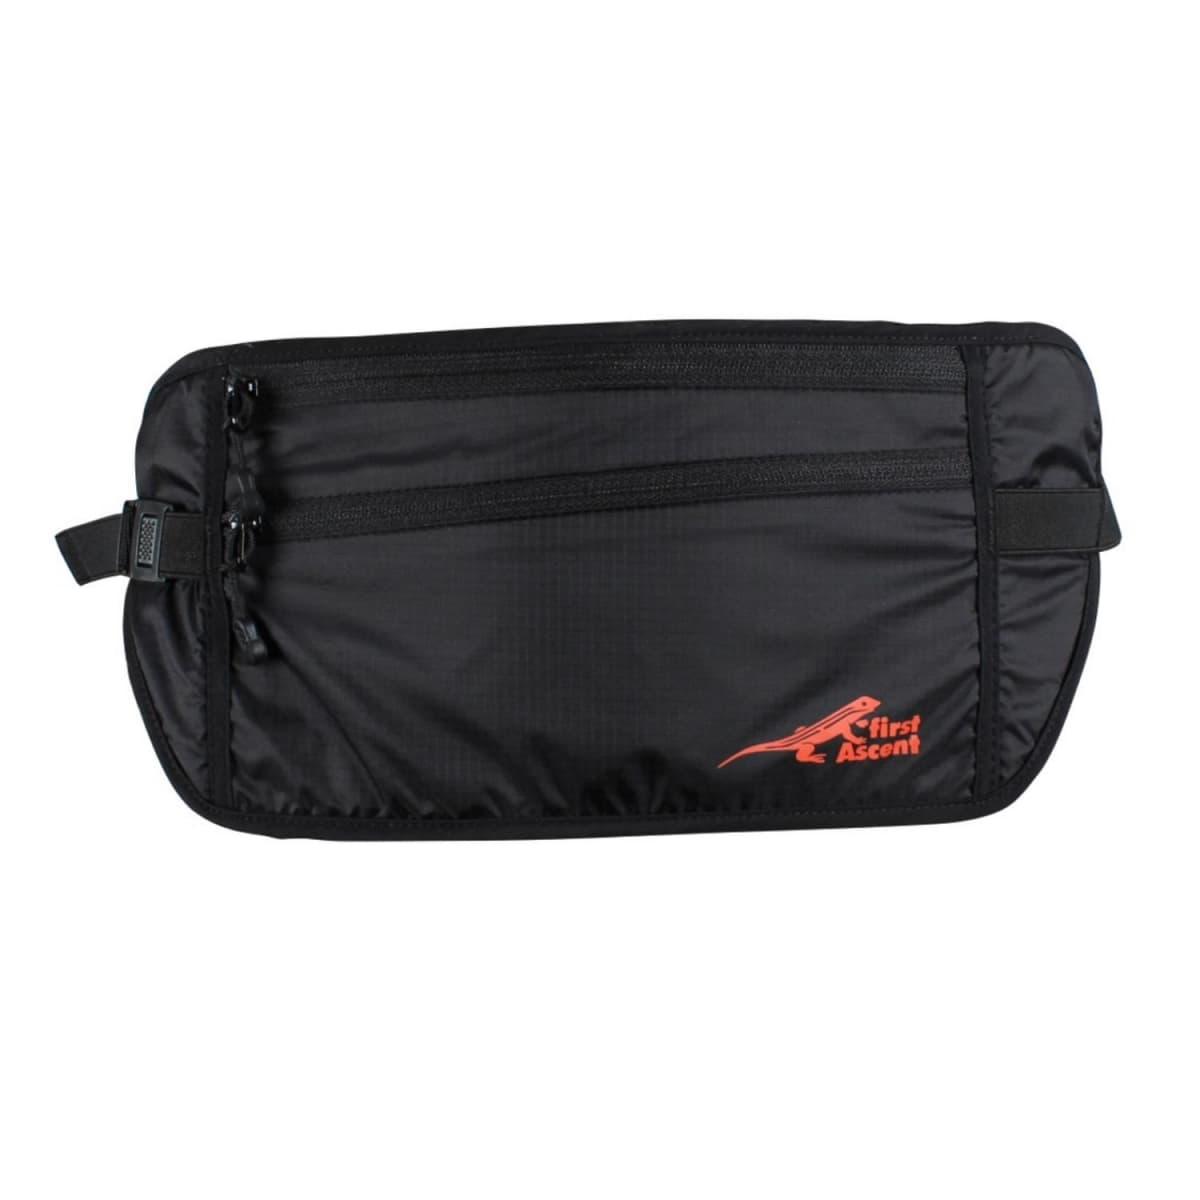 80249da763d8 Travel | Accessories | Sportsmans Warehouse